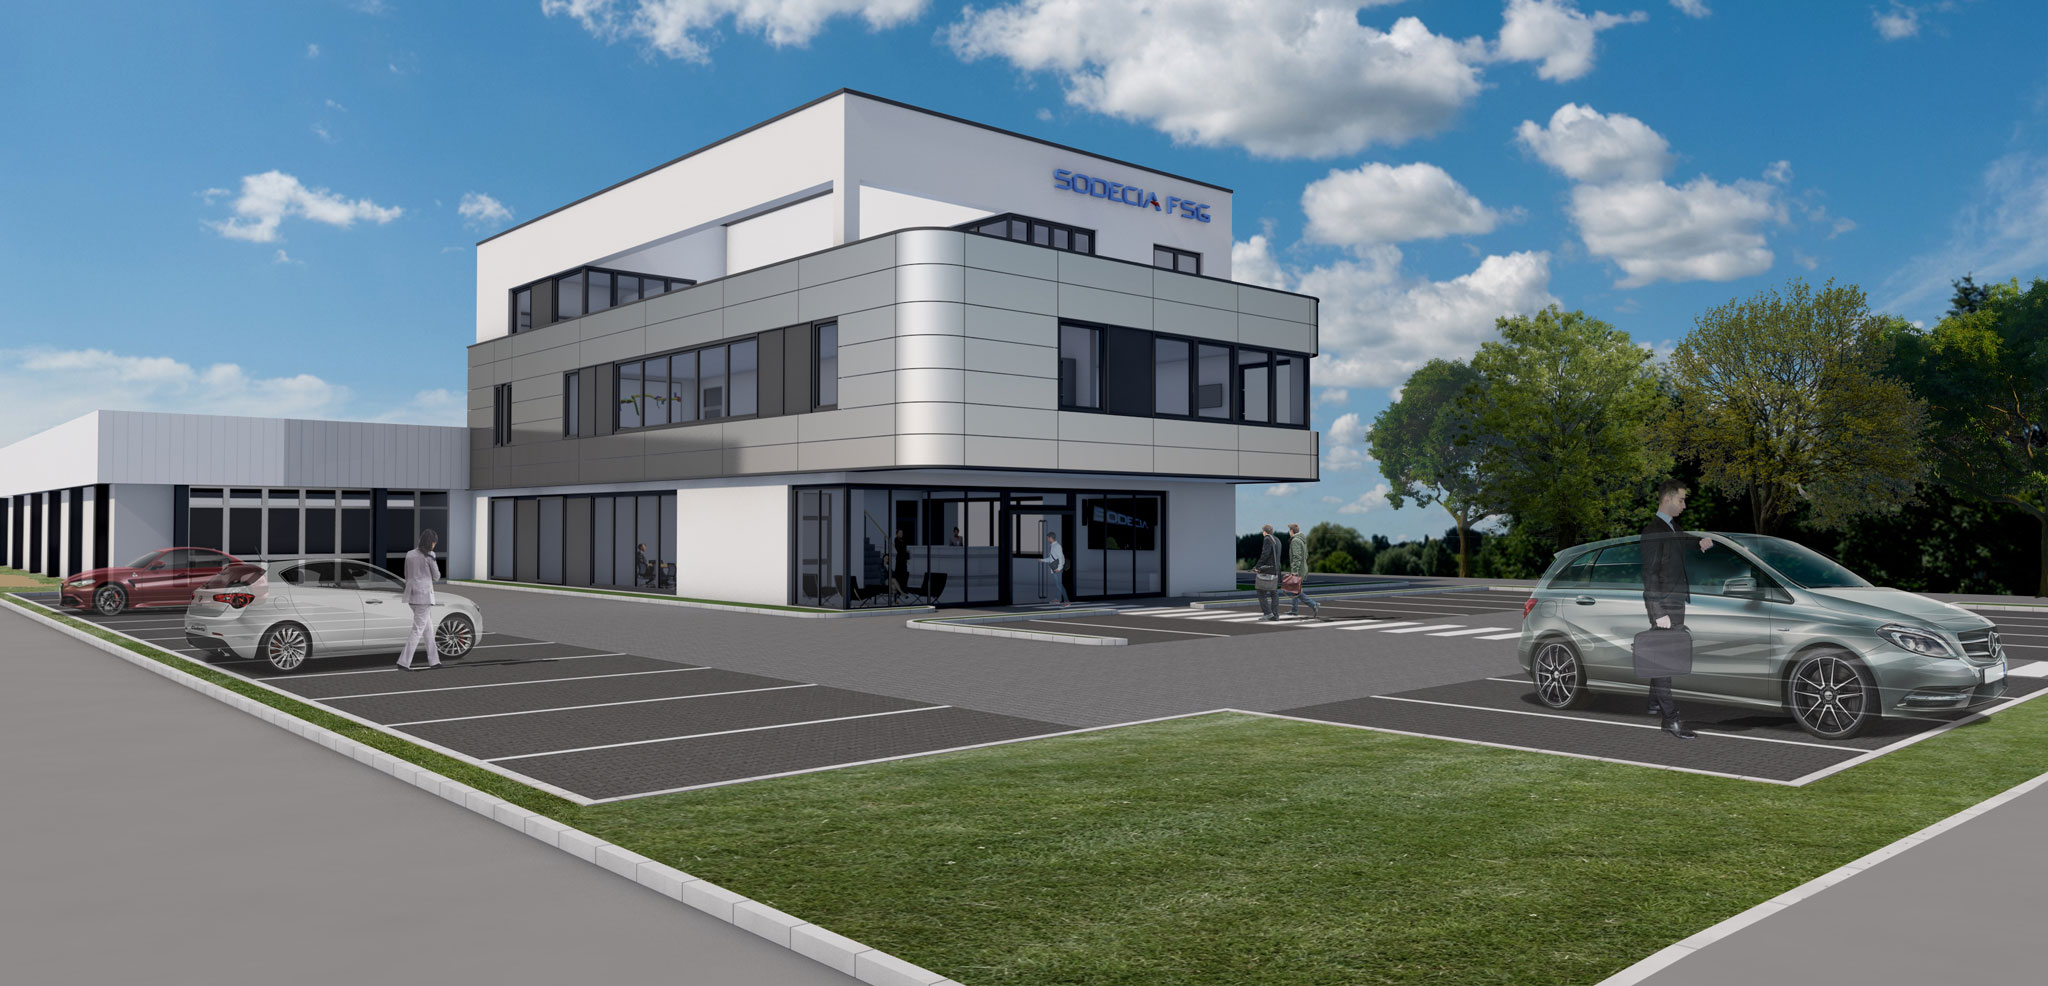 Neubau Europazentrale SODECIA FSG Schulze-Delitsch-Straße 23, Burgwedel